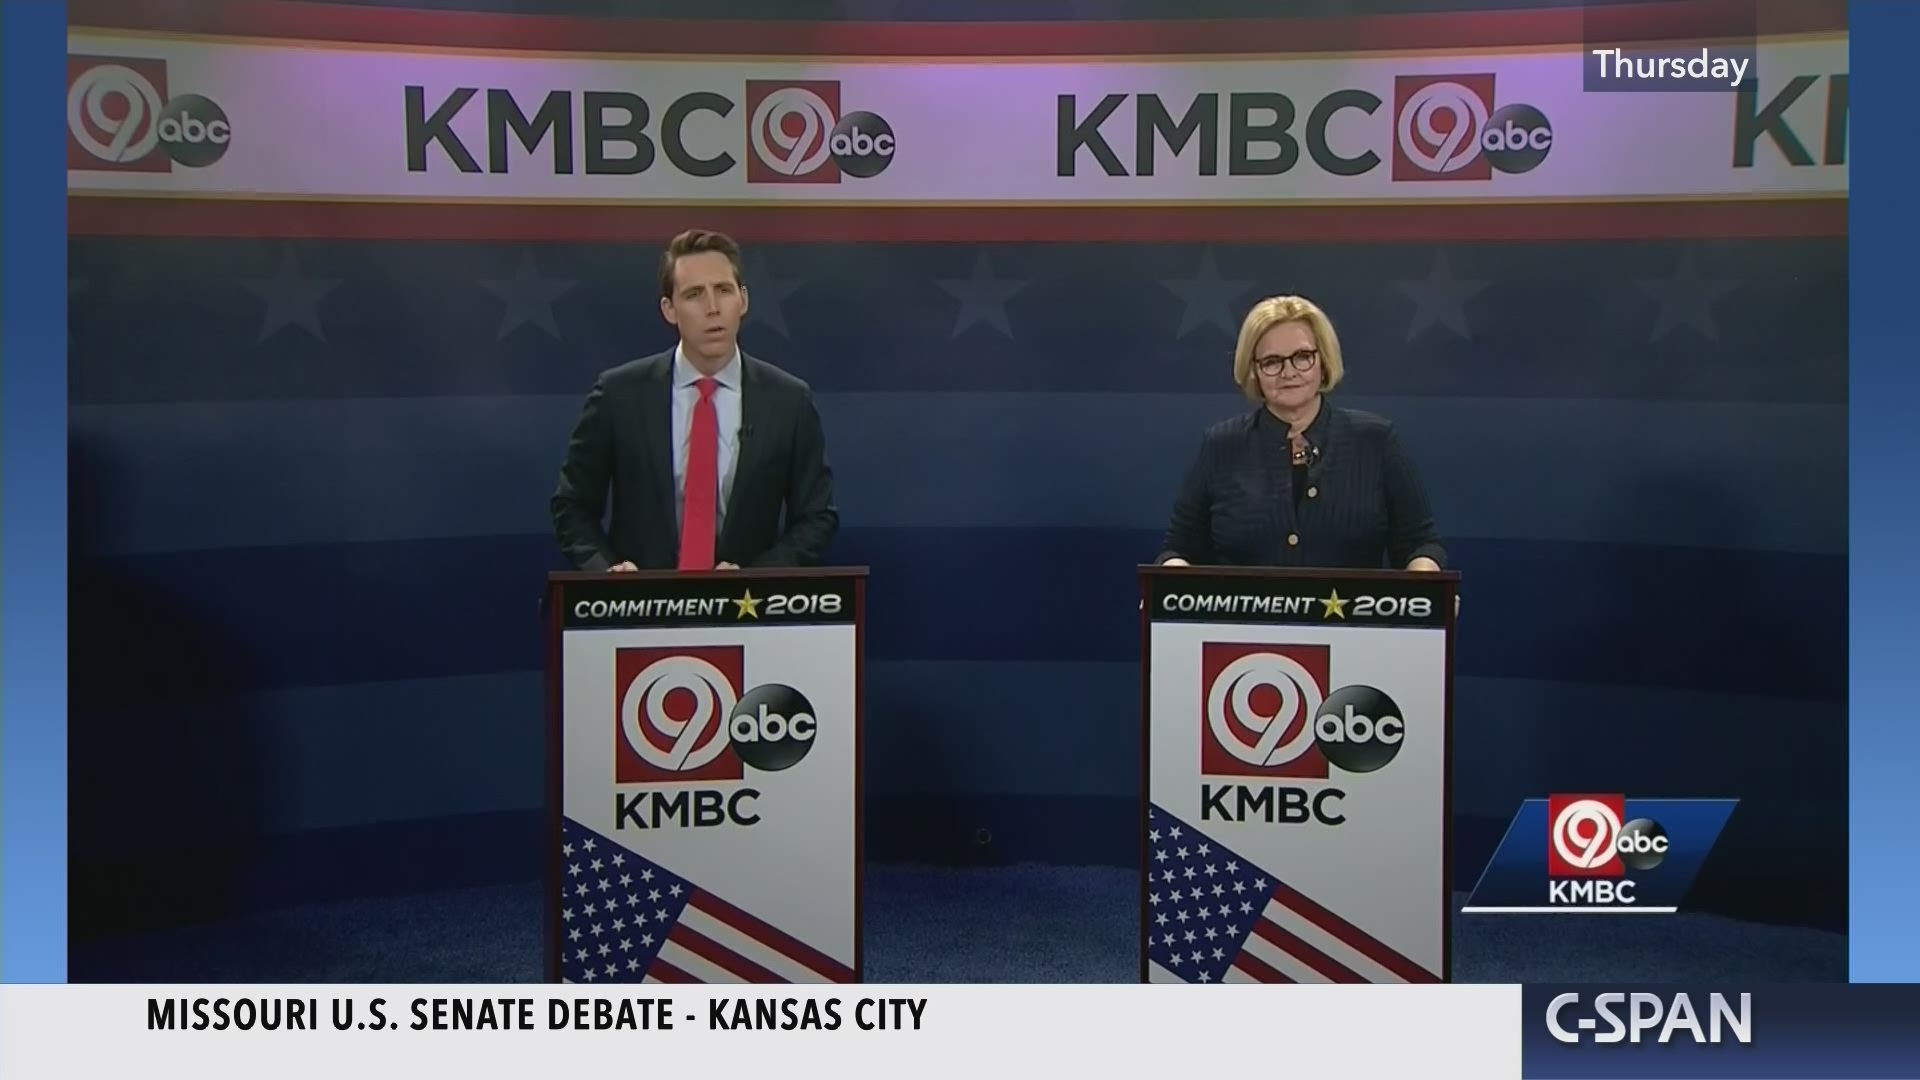 Missouri Senate Debate Oct 25 2018 Video Judges 2010 General Election November 2nd